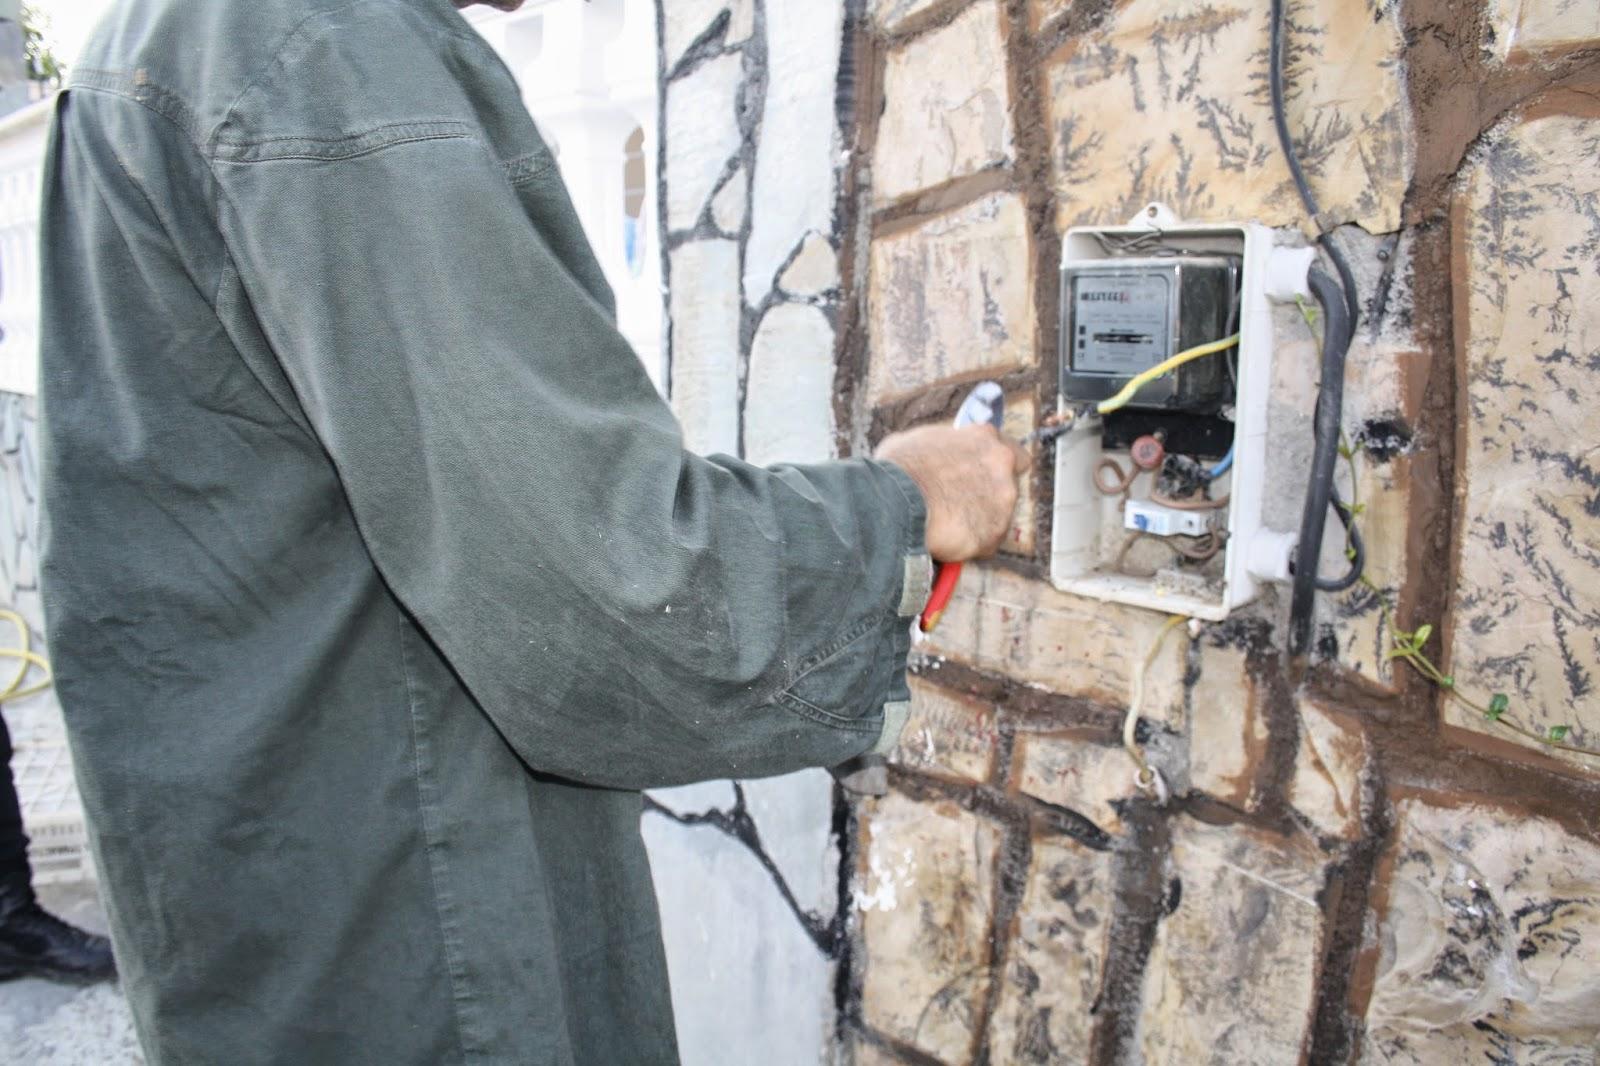 af94329e091f Ο υπάλληλος της ΔΕΗ ήταν κλέφτης - SalonicaNews